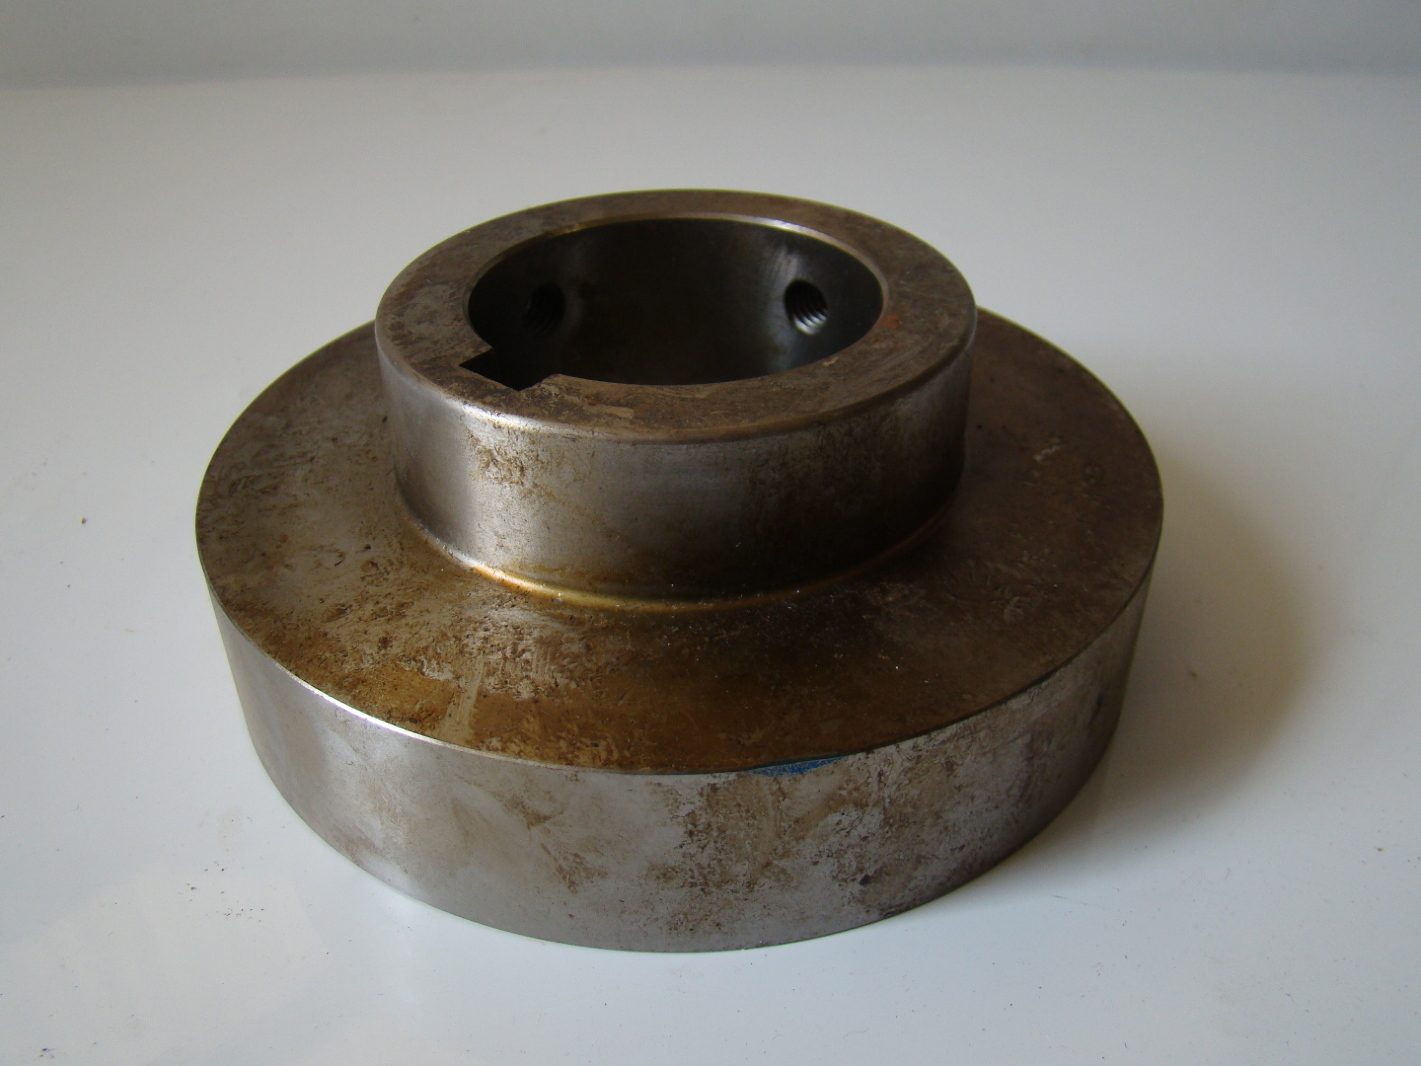 Brake Spindle Tool : Spindle drum brake ham mond polisher ebay